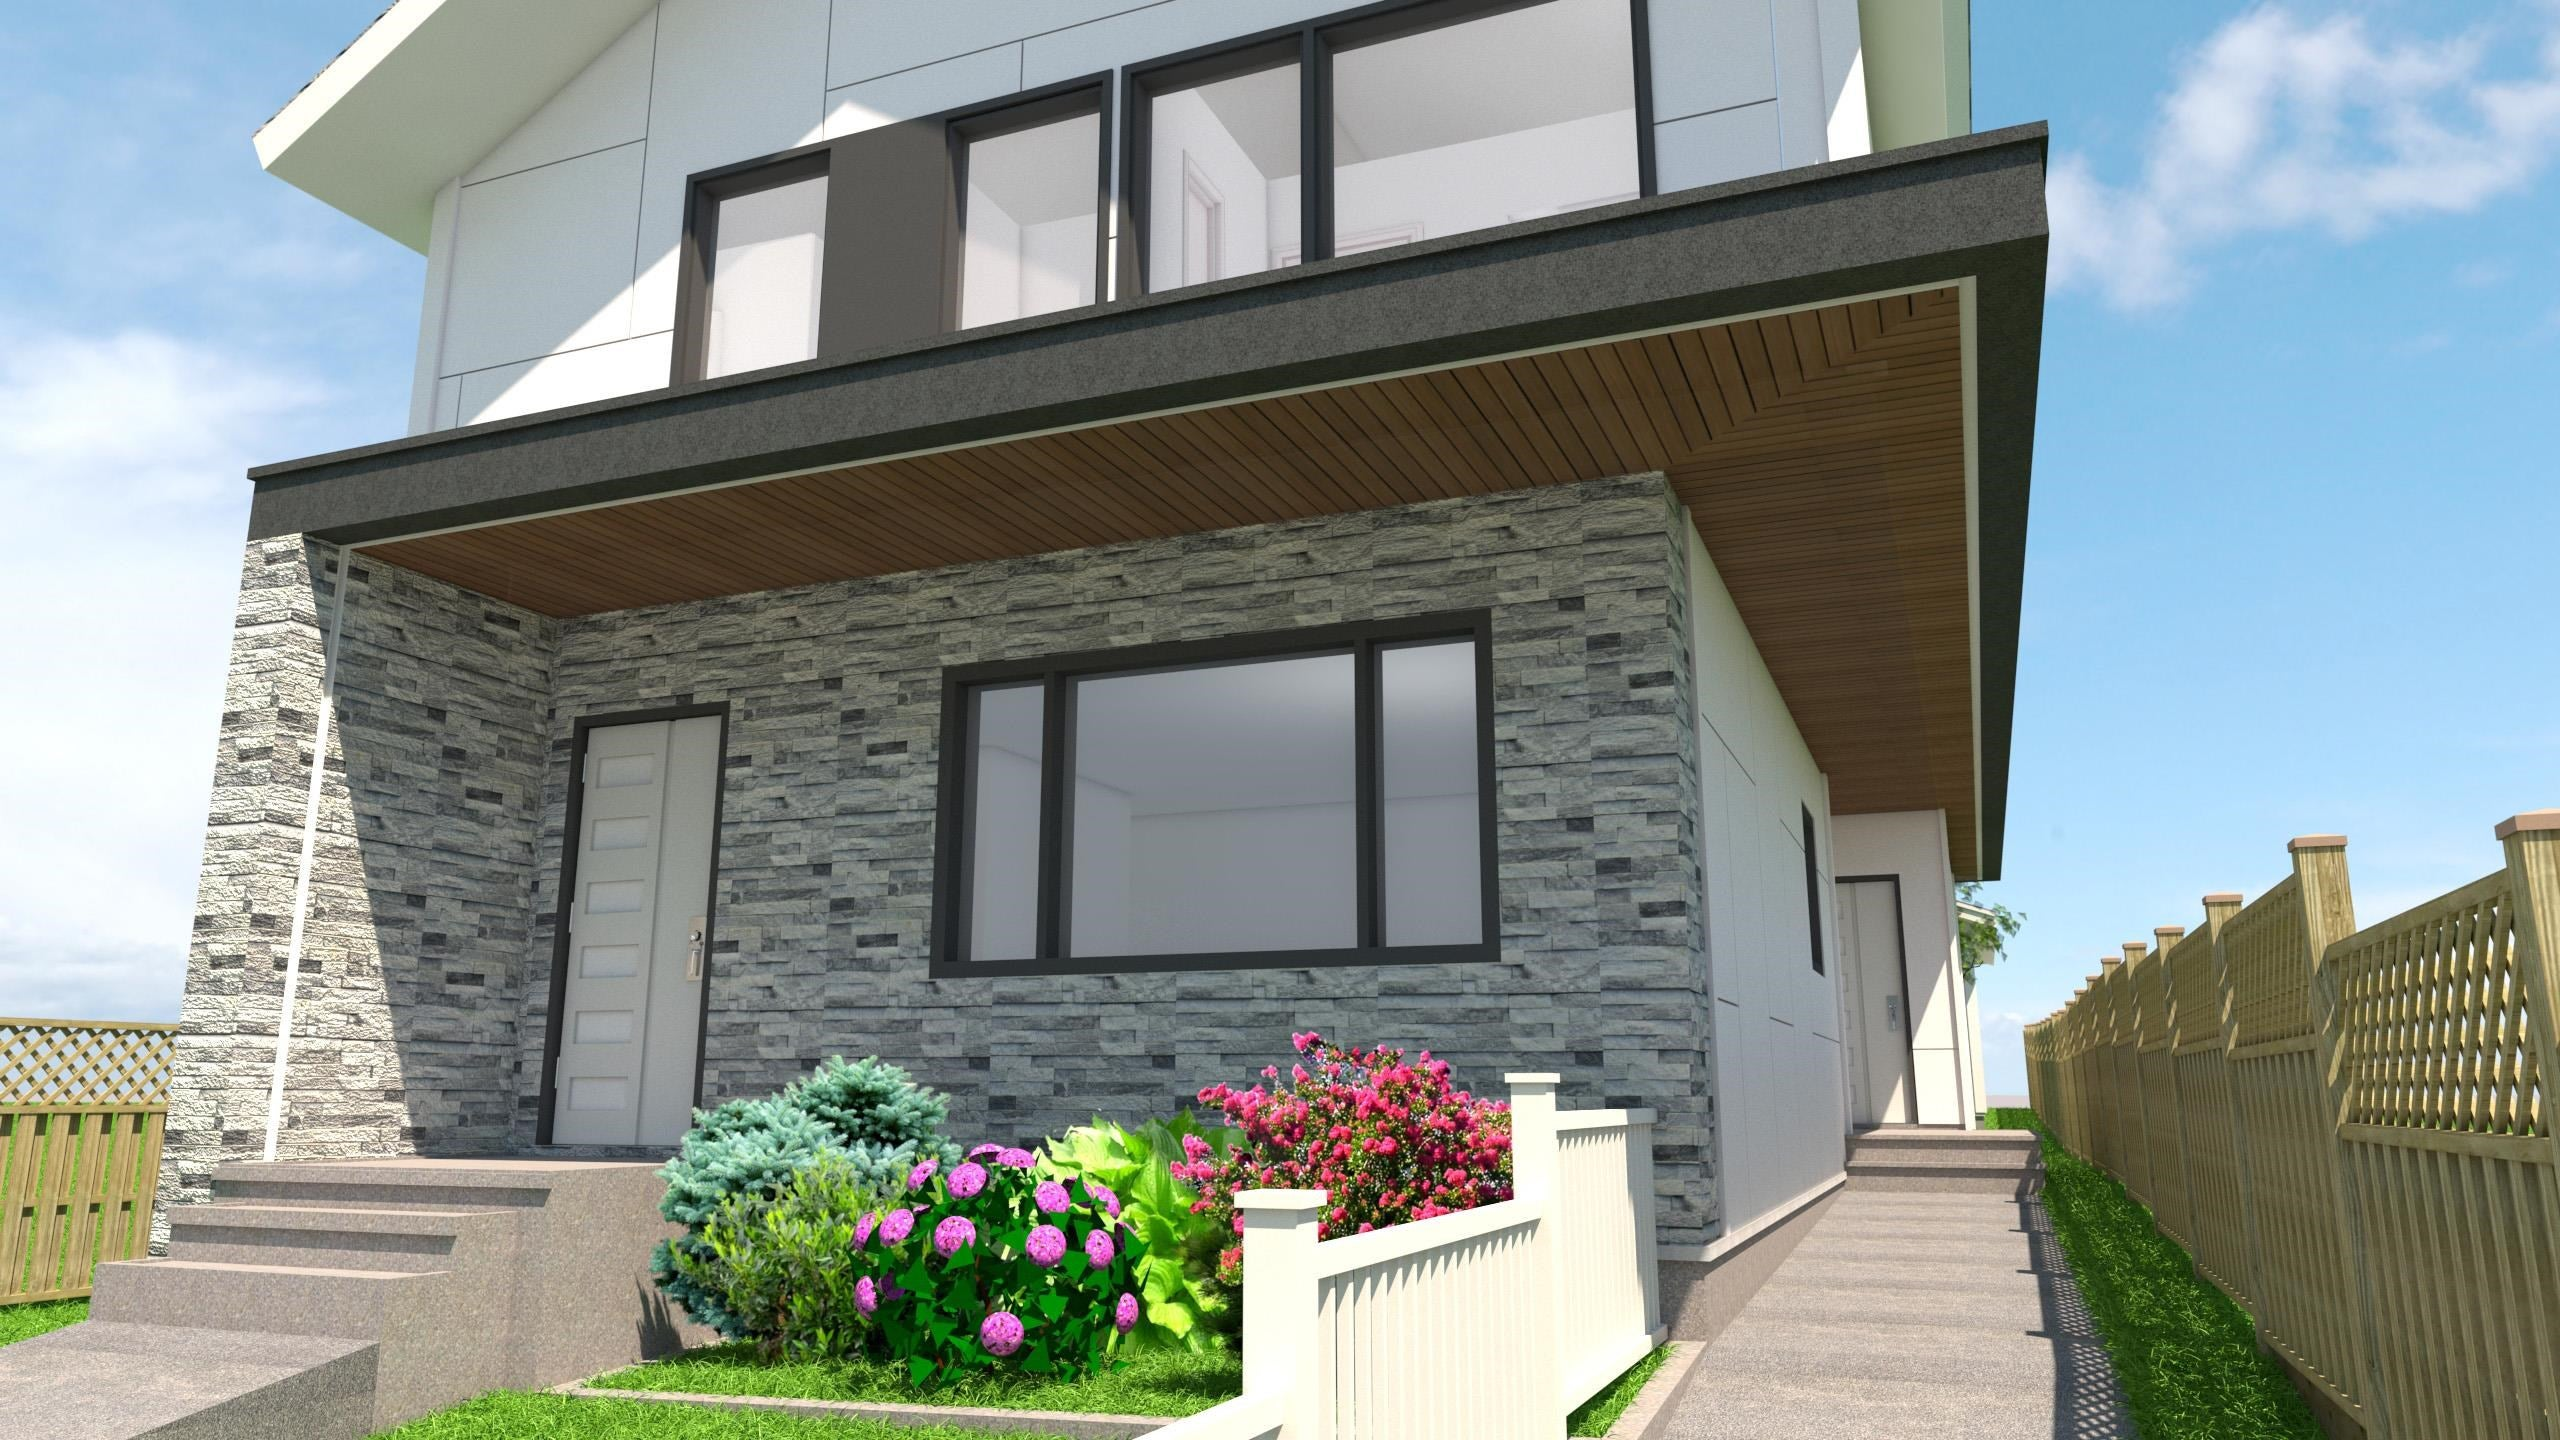 SL#1 2465 E 23RD AVENUE - Renfrew Heights 1/2 Duplex for sale, 3 Bedrooms (R2622107) - #1